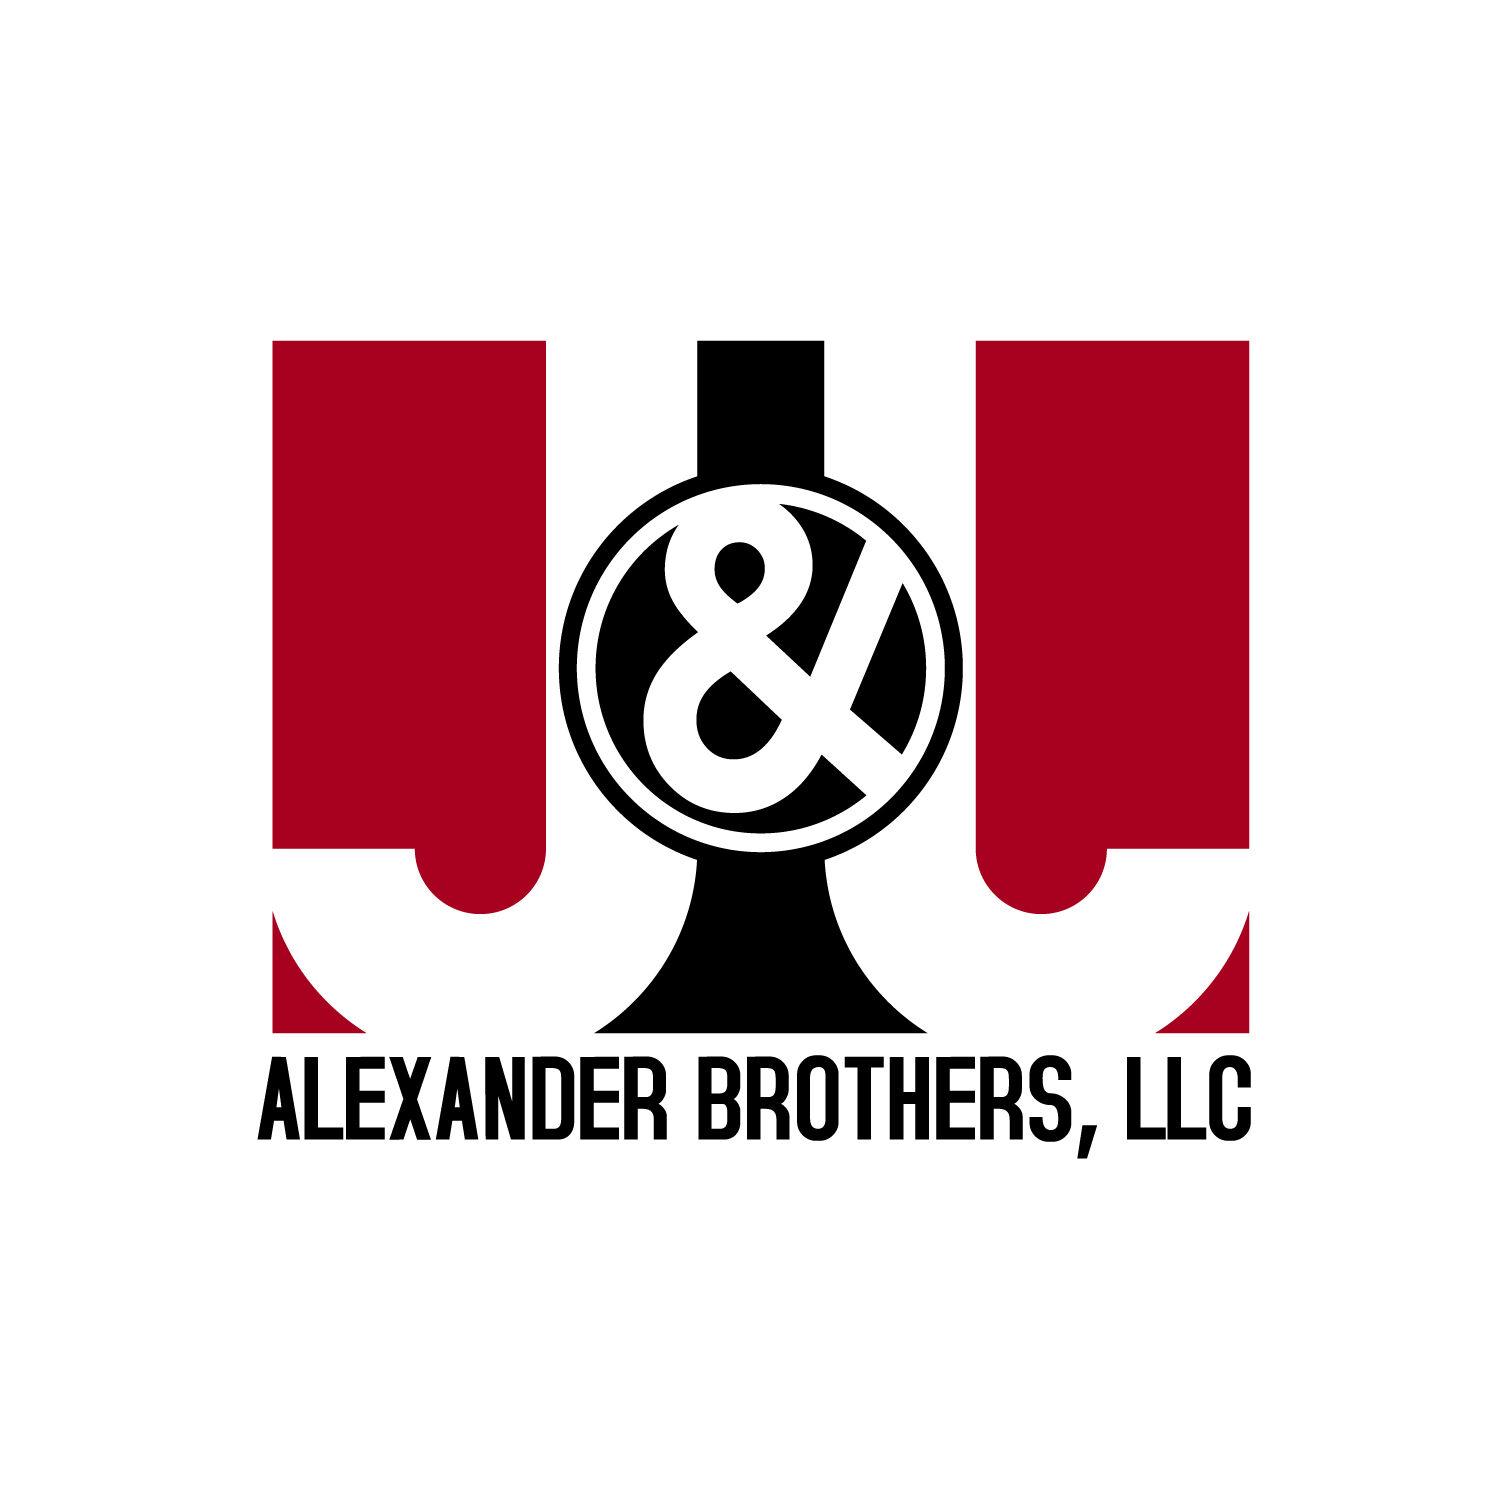 J&J Alexander Brothers